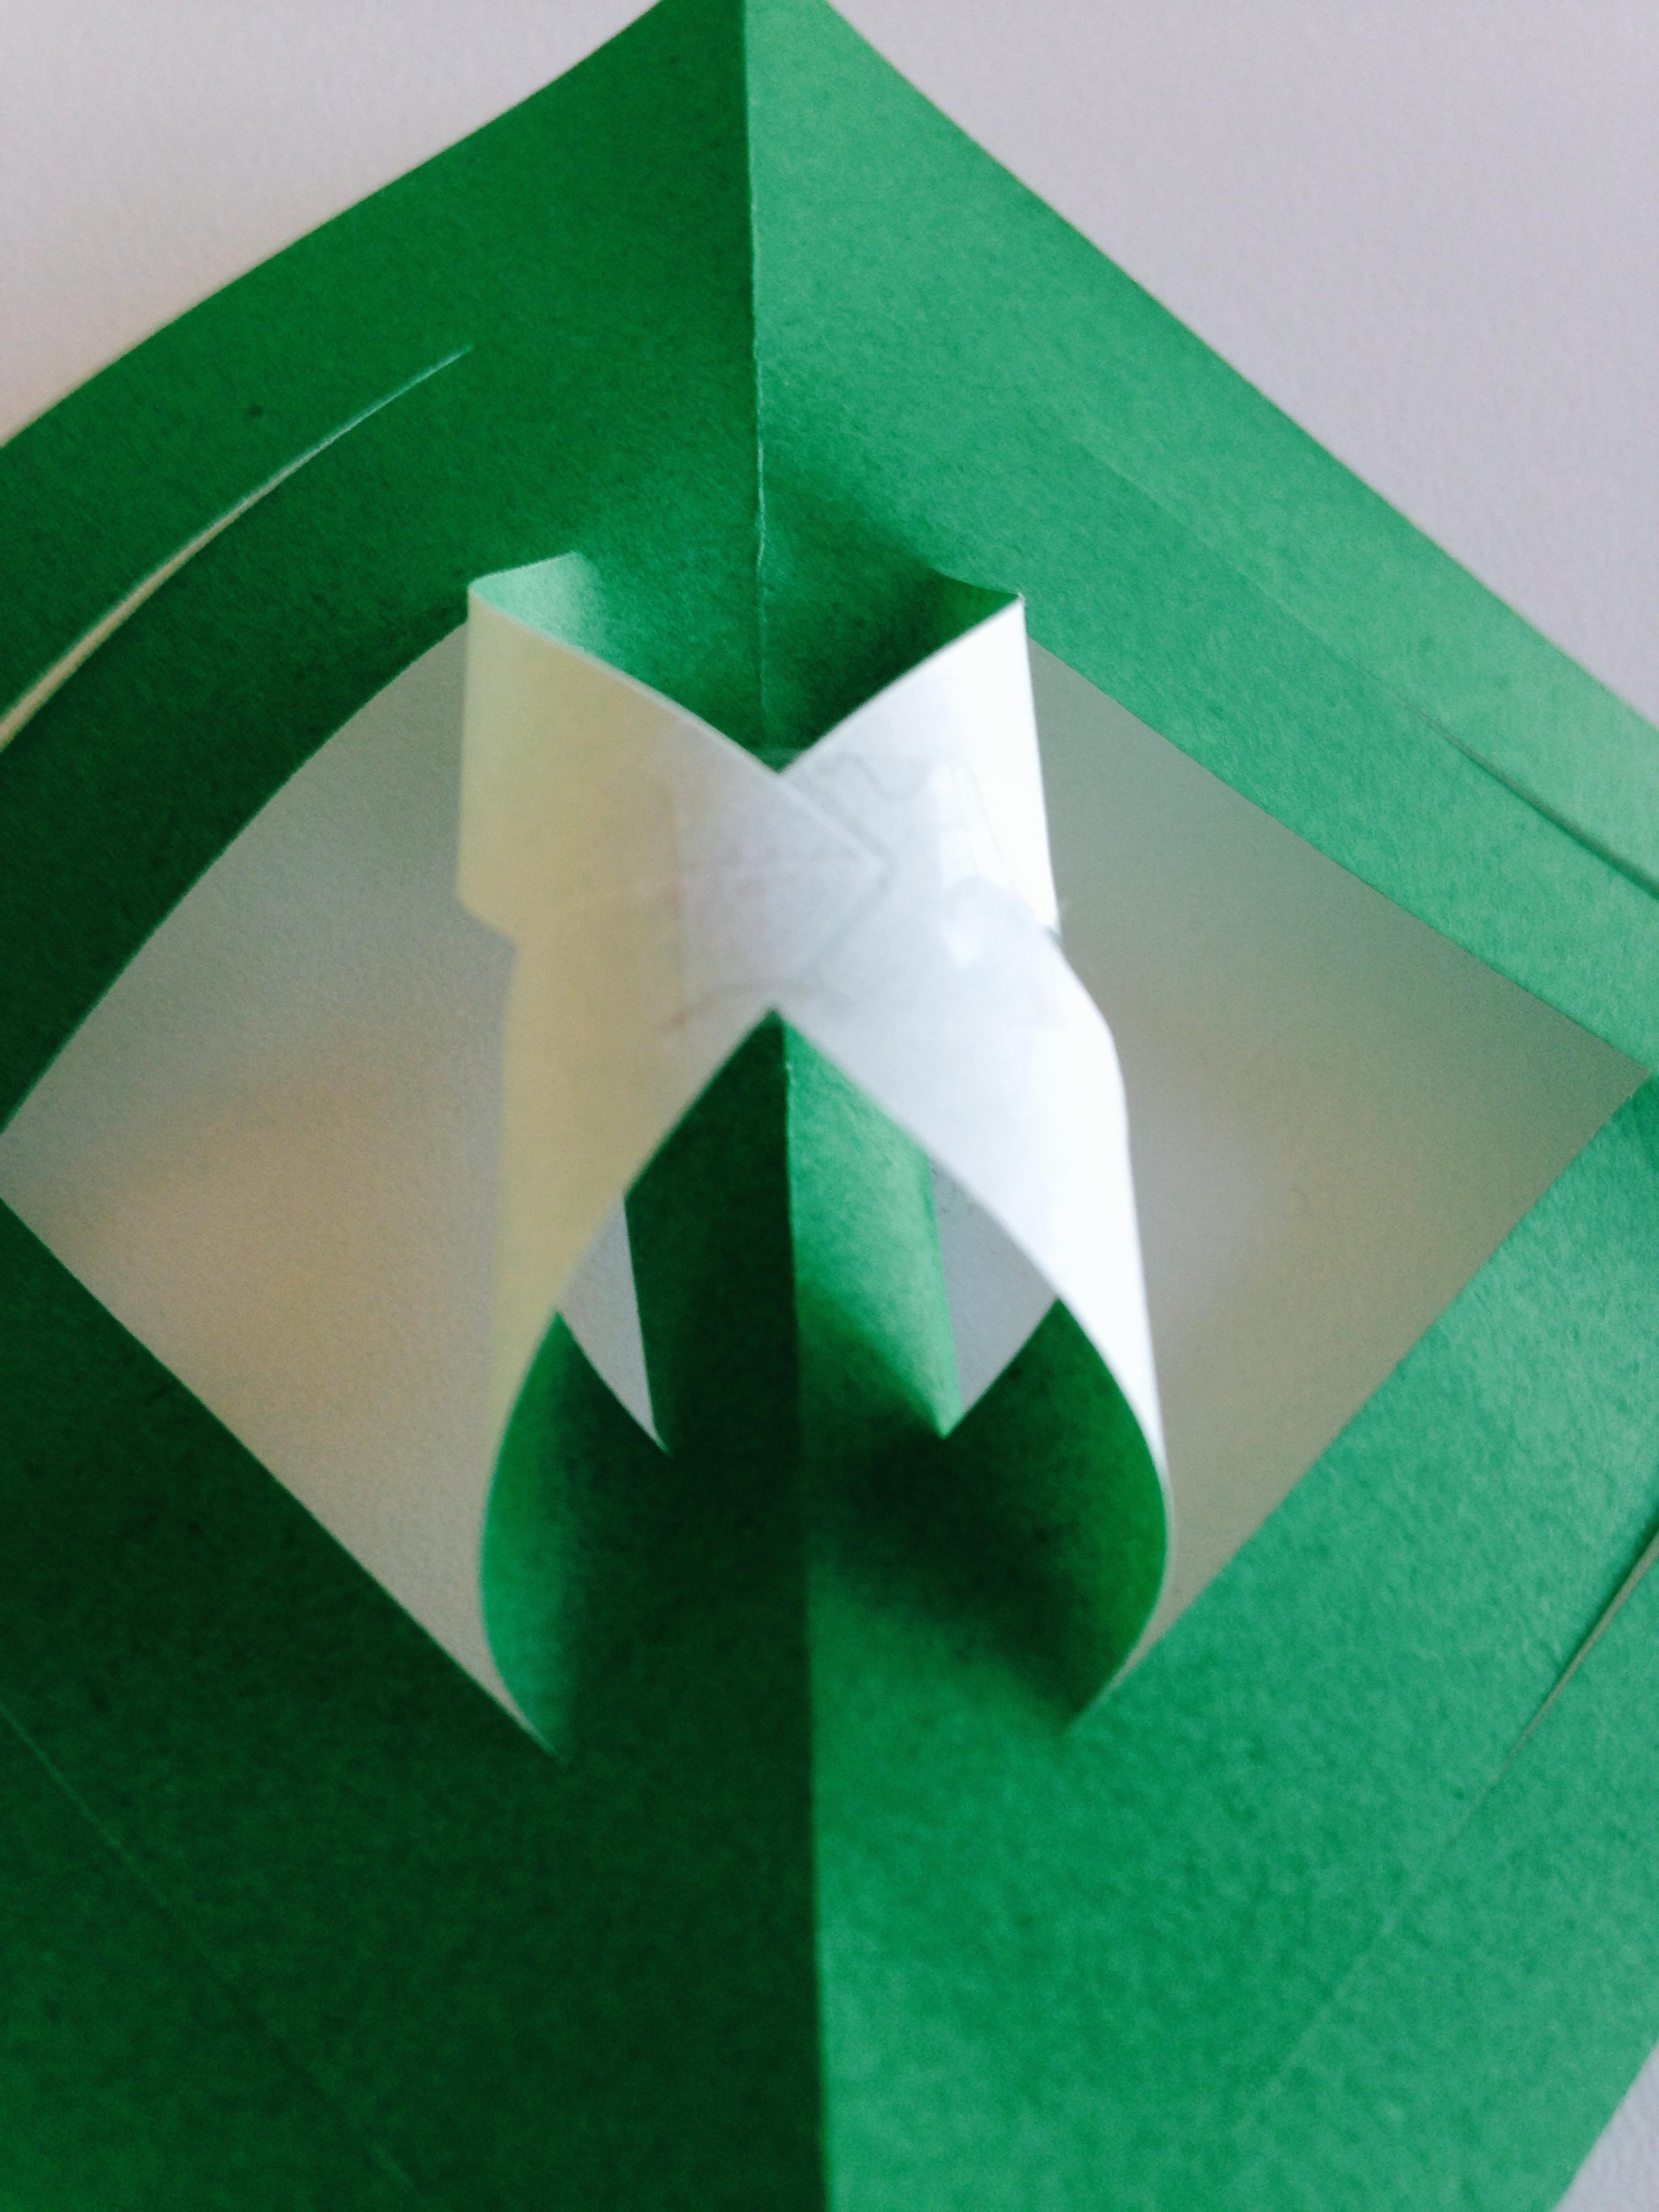 Diy 3d paper snowflakes for Diy paper snowflakes 3d